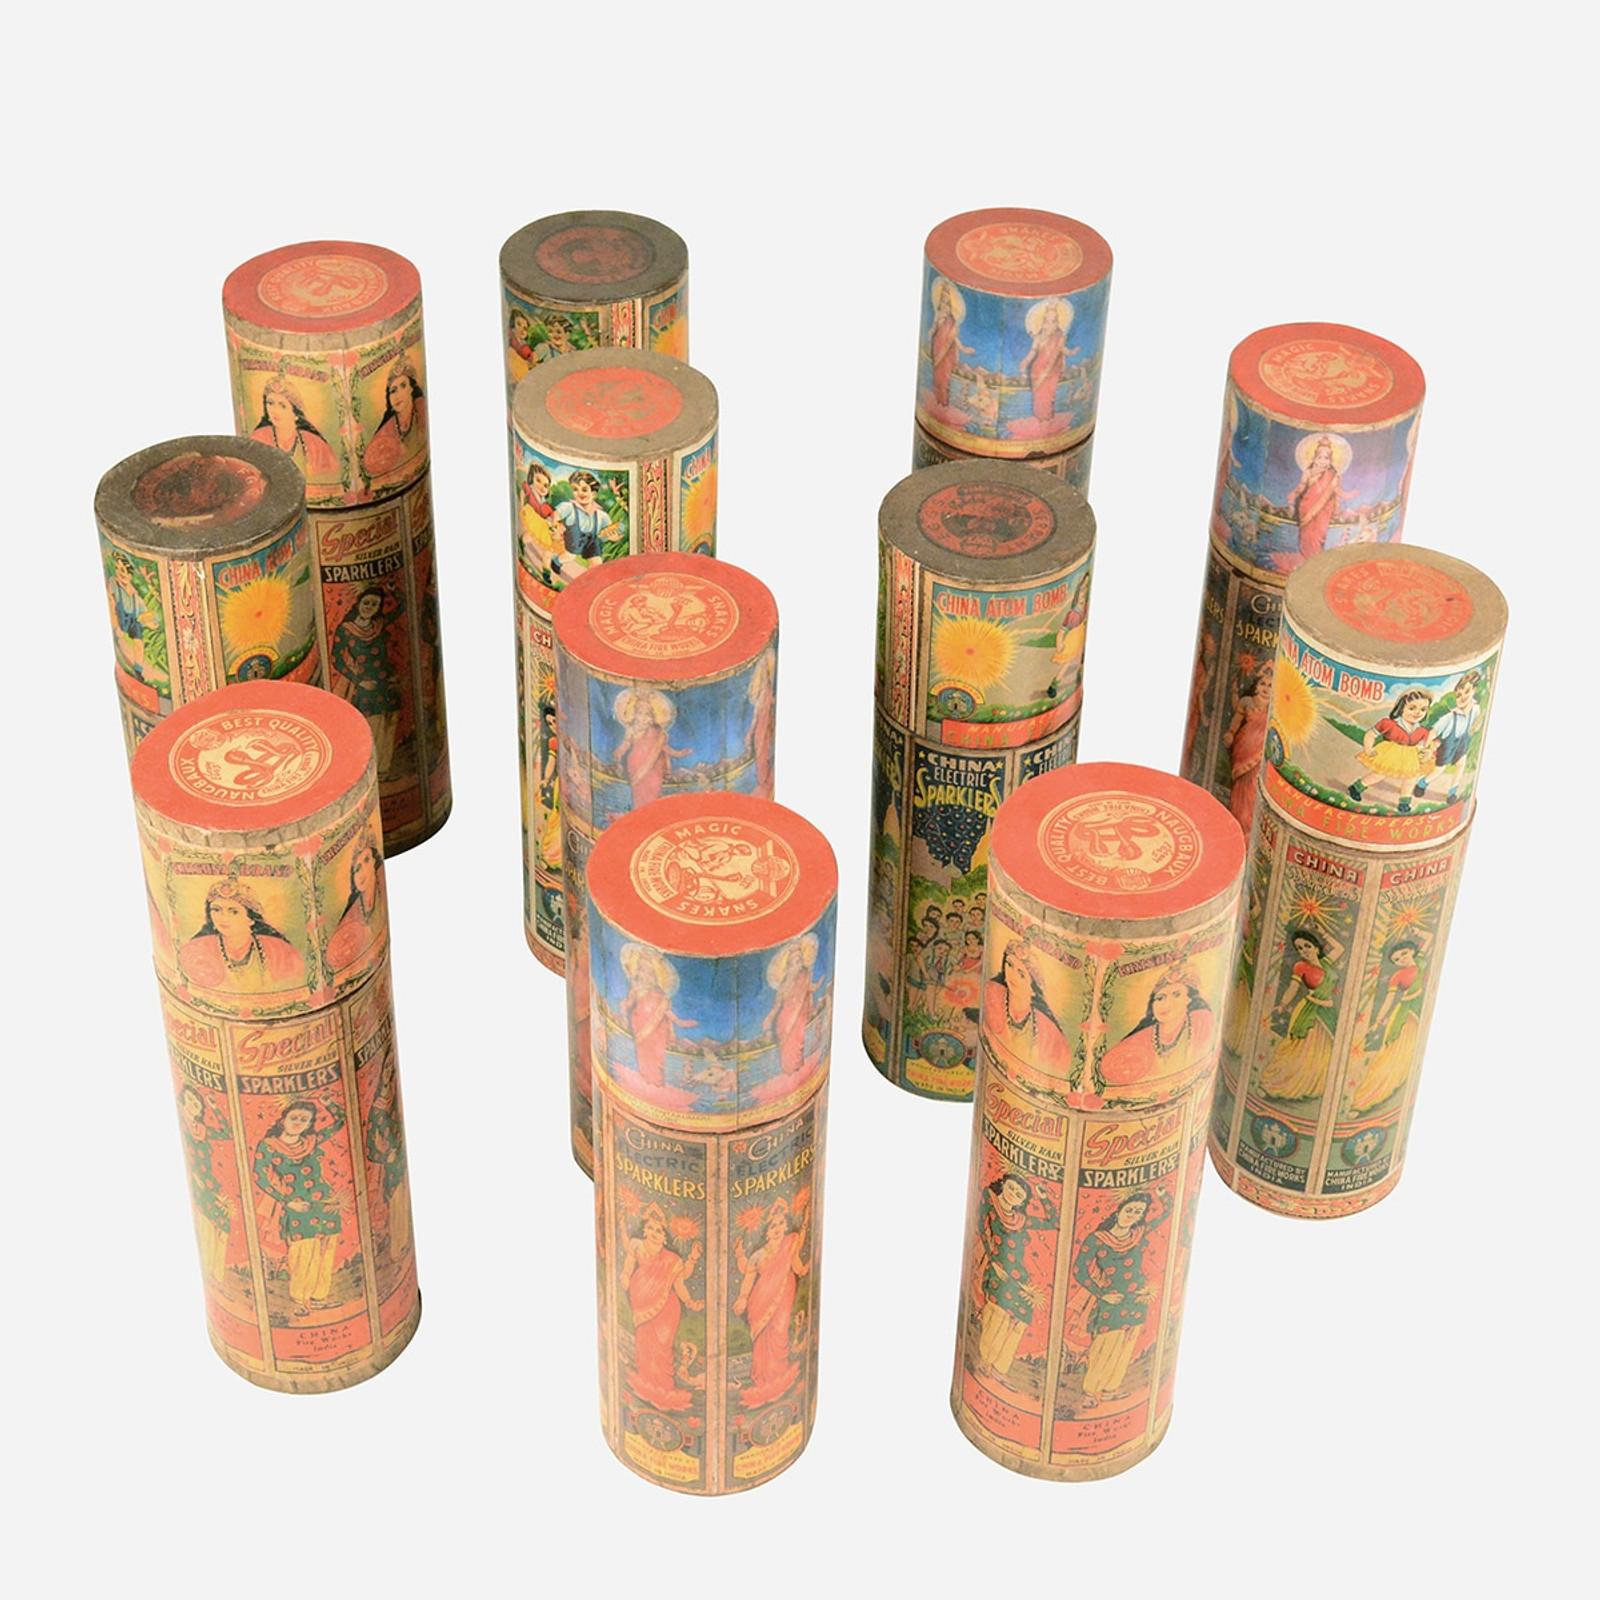 Paper-Mache Sparkler Box, Tall